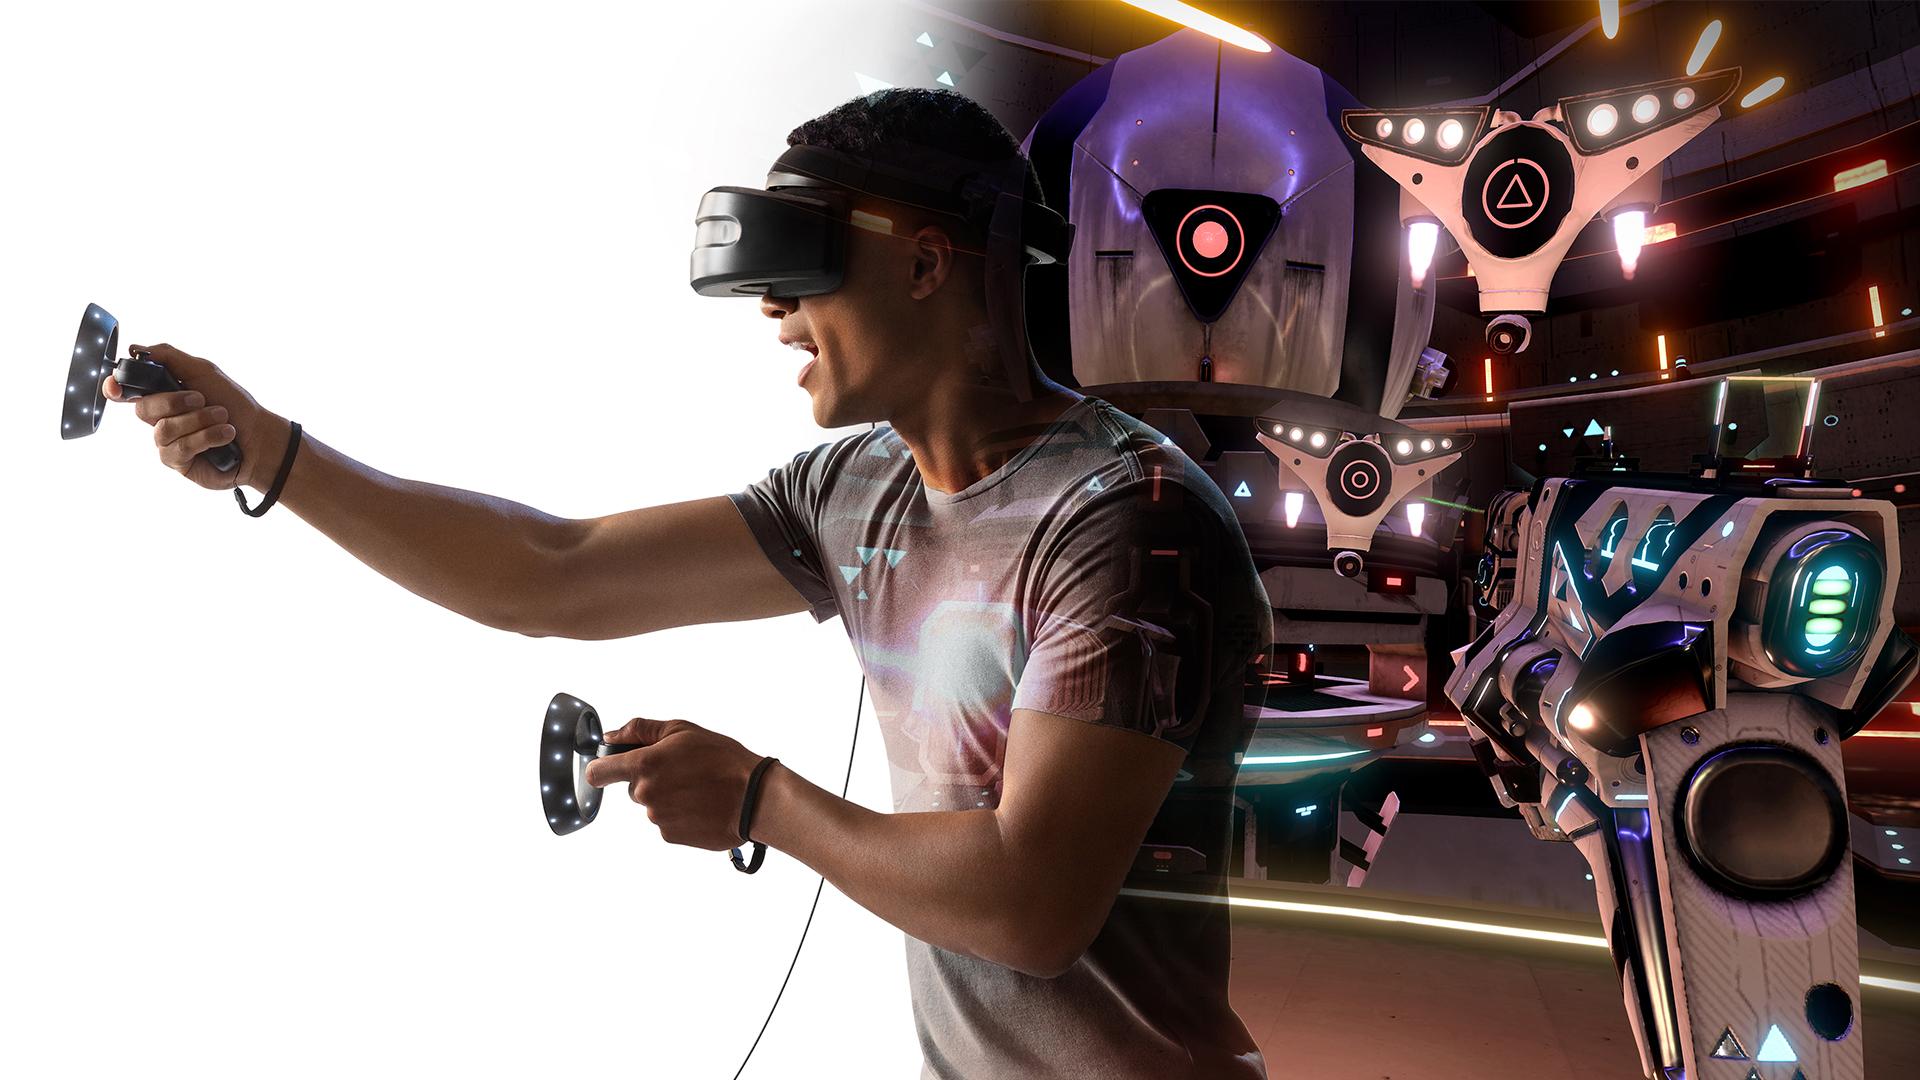 Windows Mixed Reality デバイスを使用して Space Pirate Trainer で遊んでいる男性